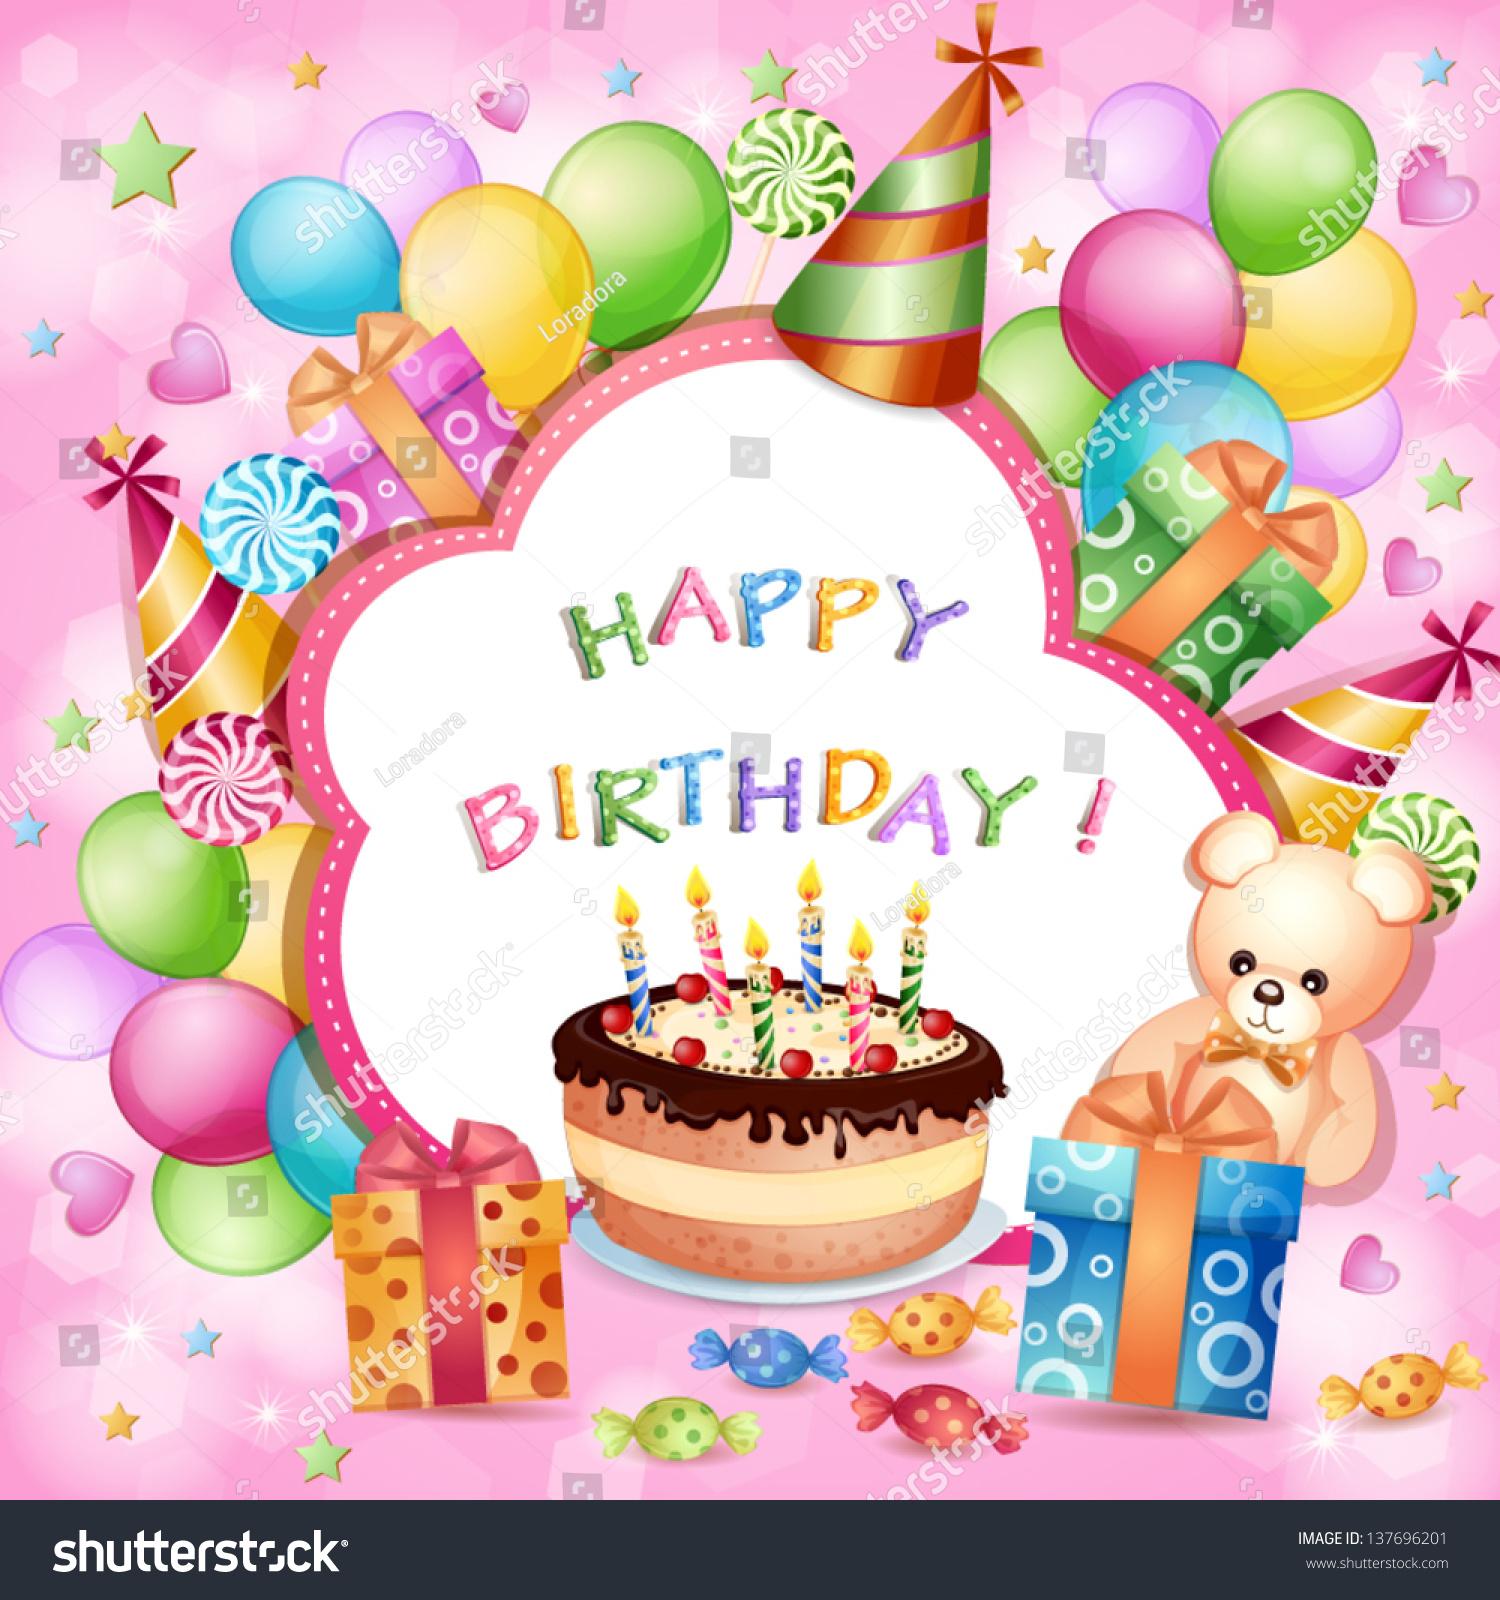 Birthday Card Birthday Cake Balloons Gifts Stock Vector Royalty